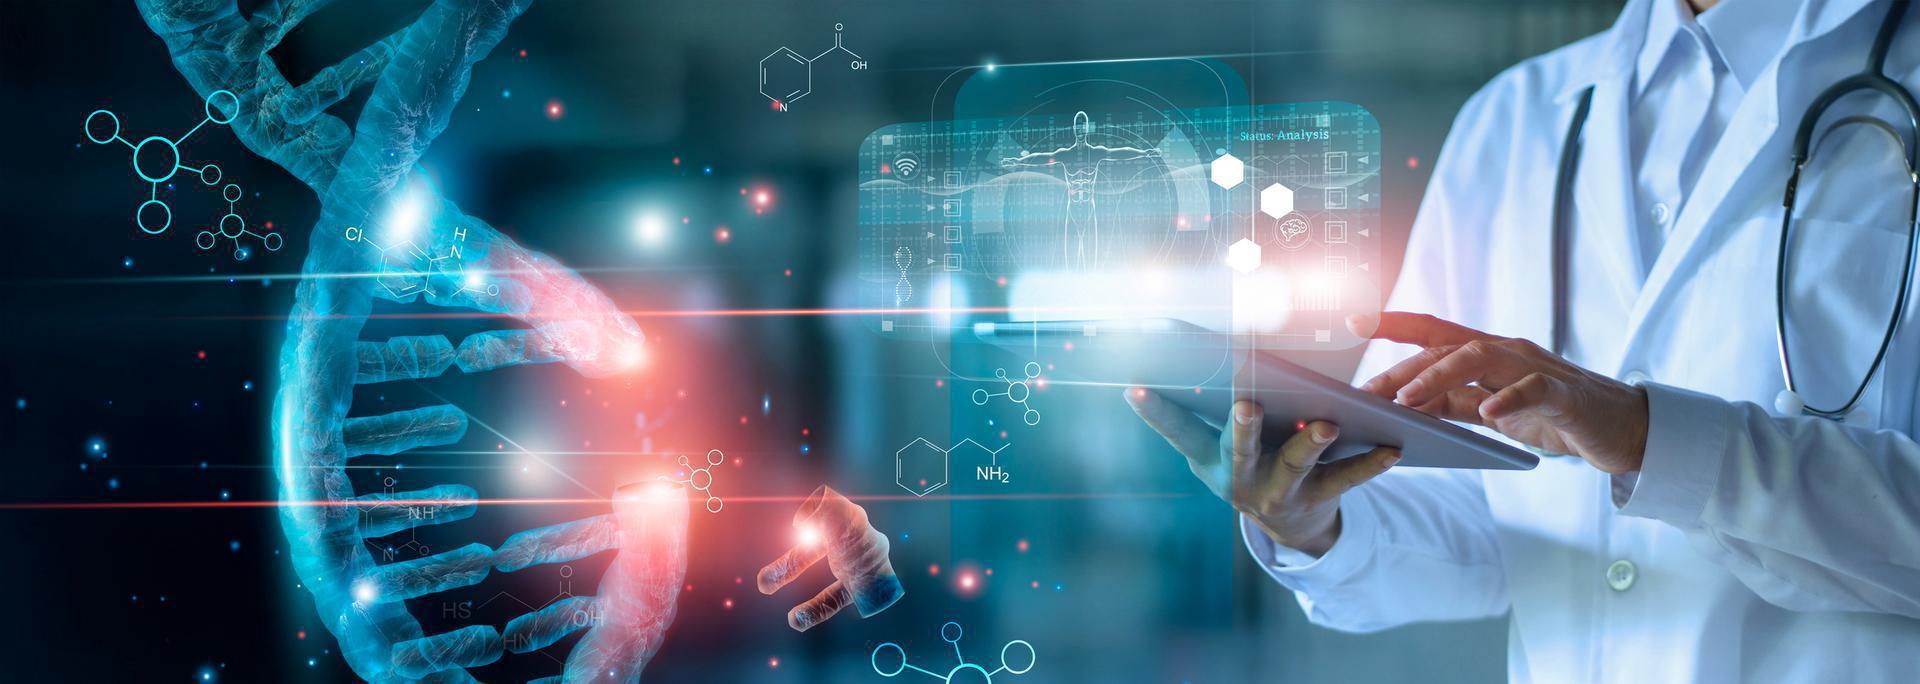 Drug Testing and DNA Testing - Orem UT - featured